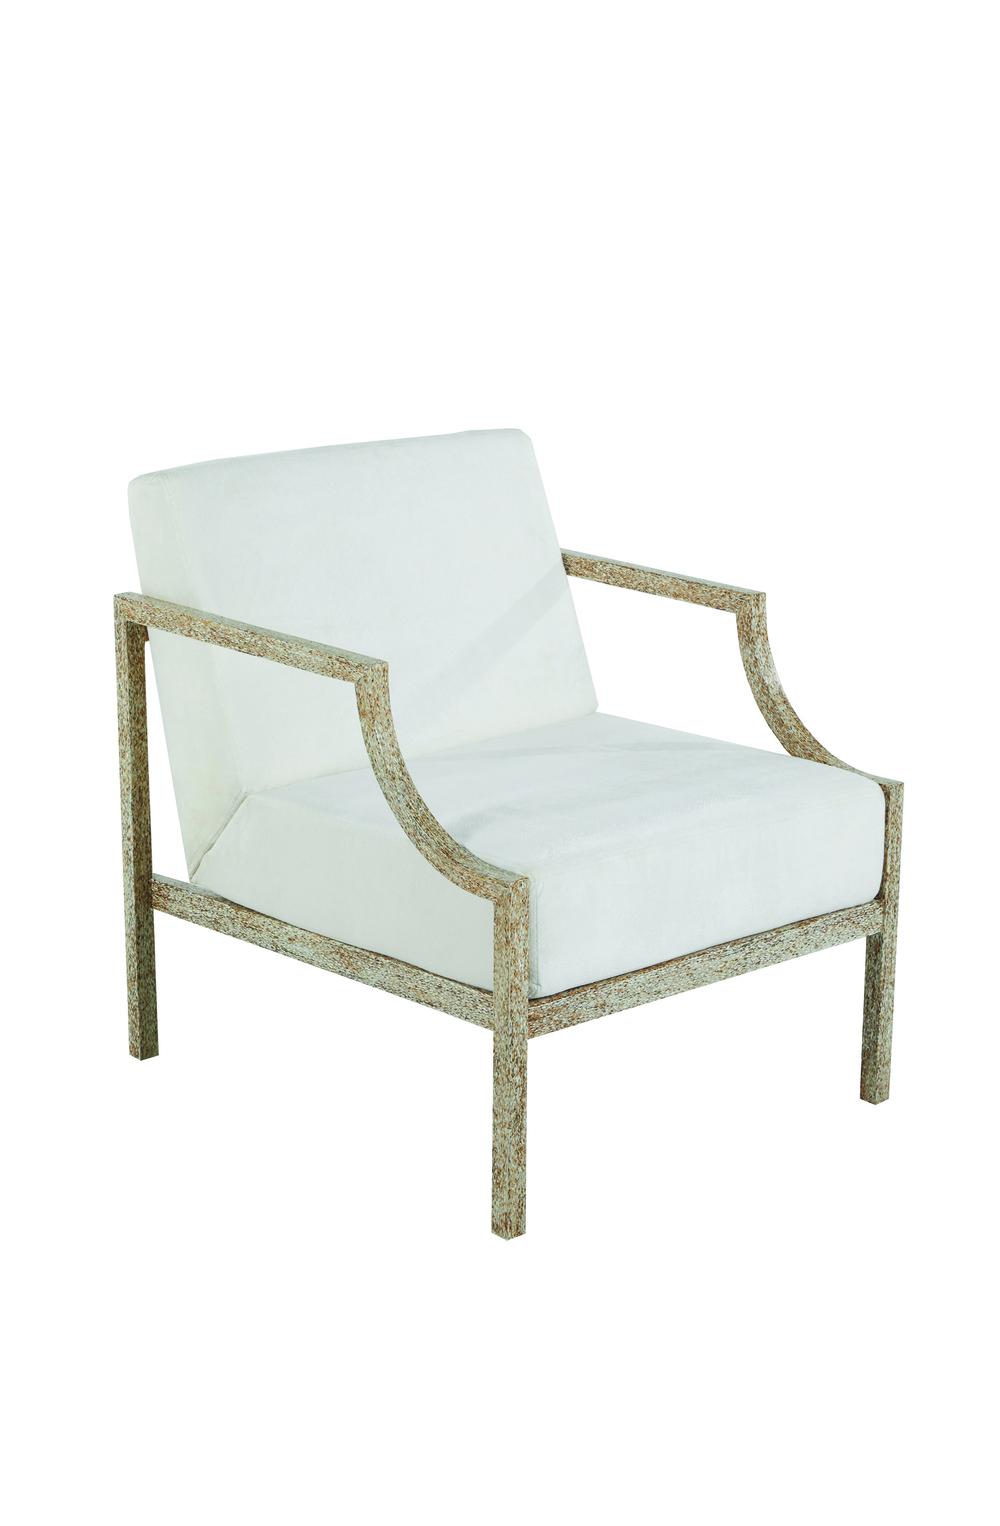 Gabby Home - Zilar Lounge Chair